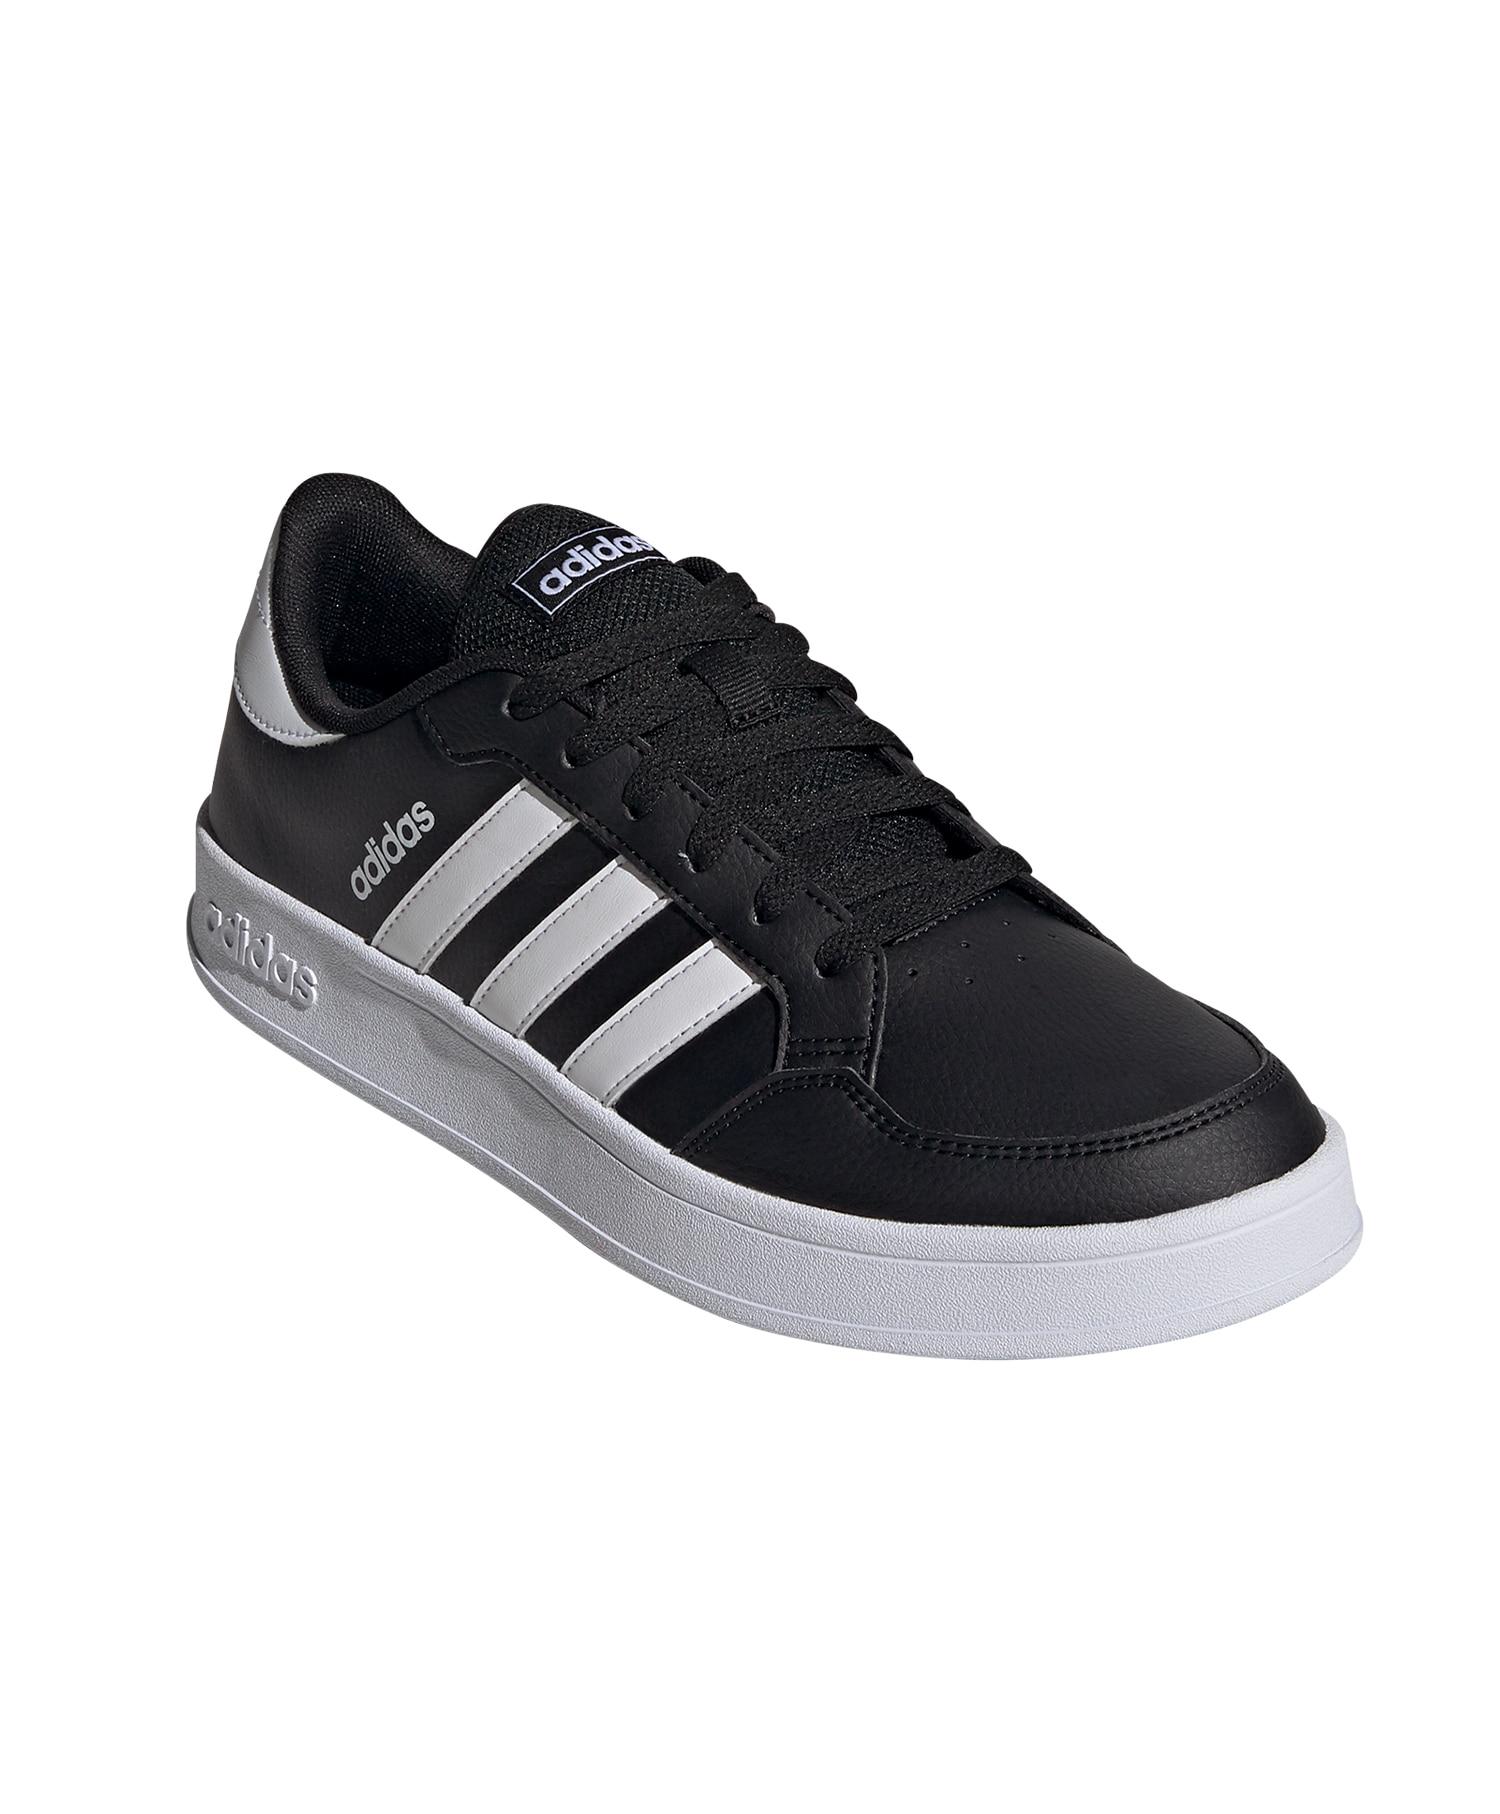 Adidas BREAKENET sko